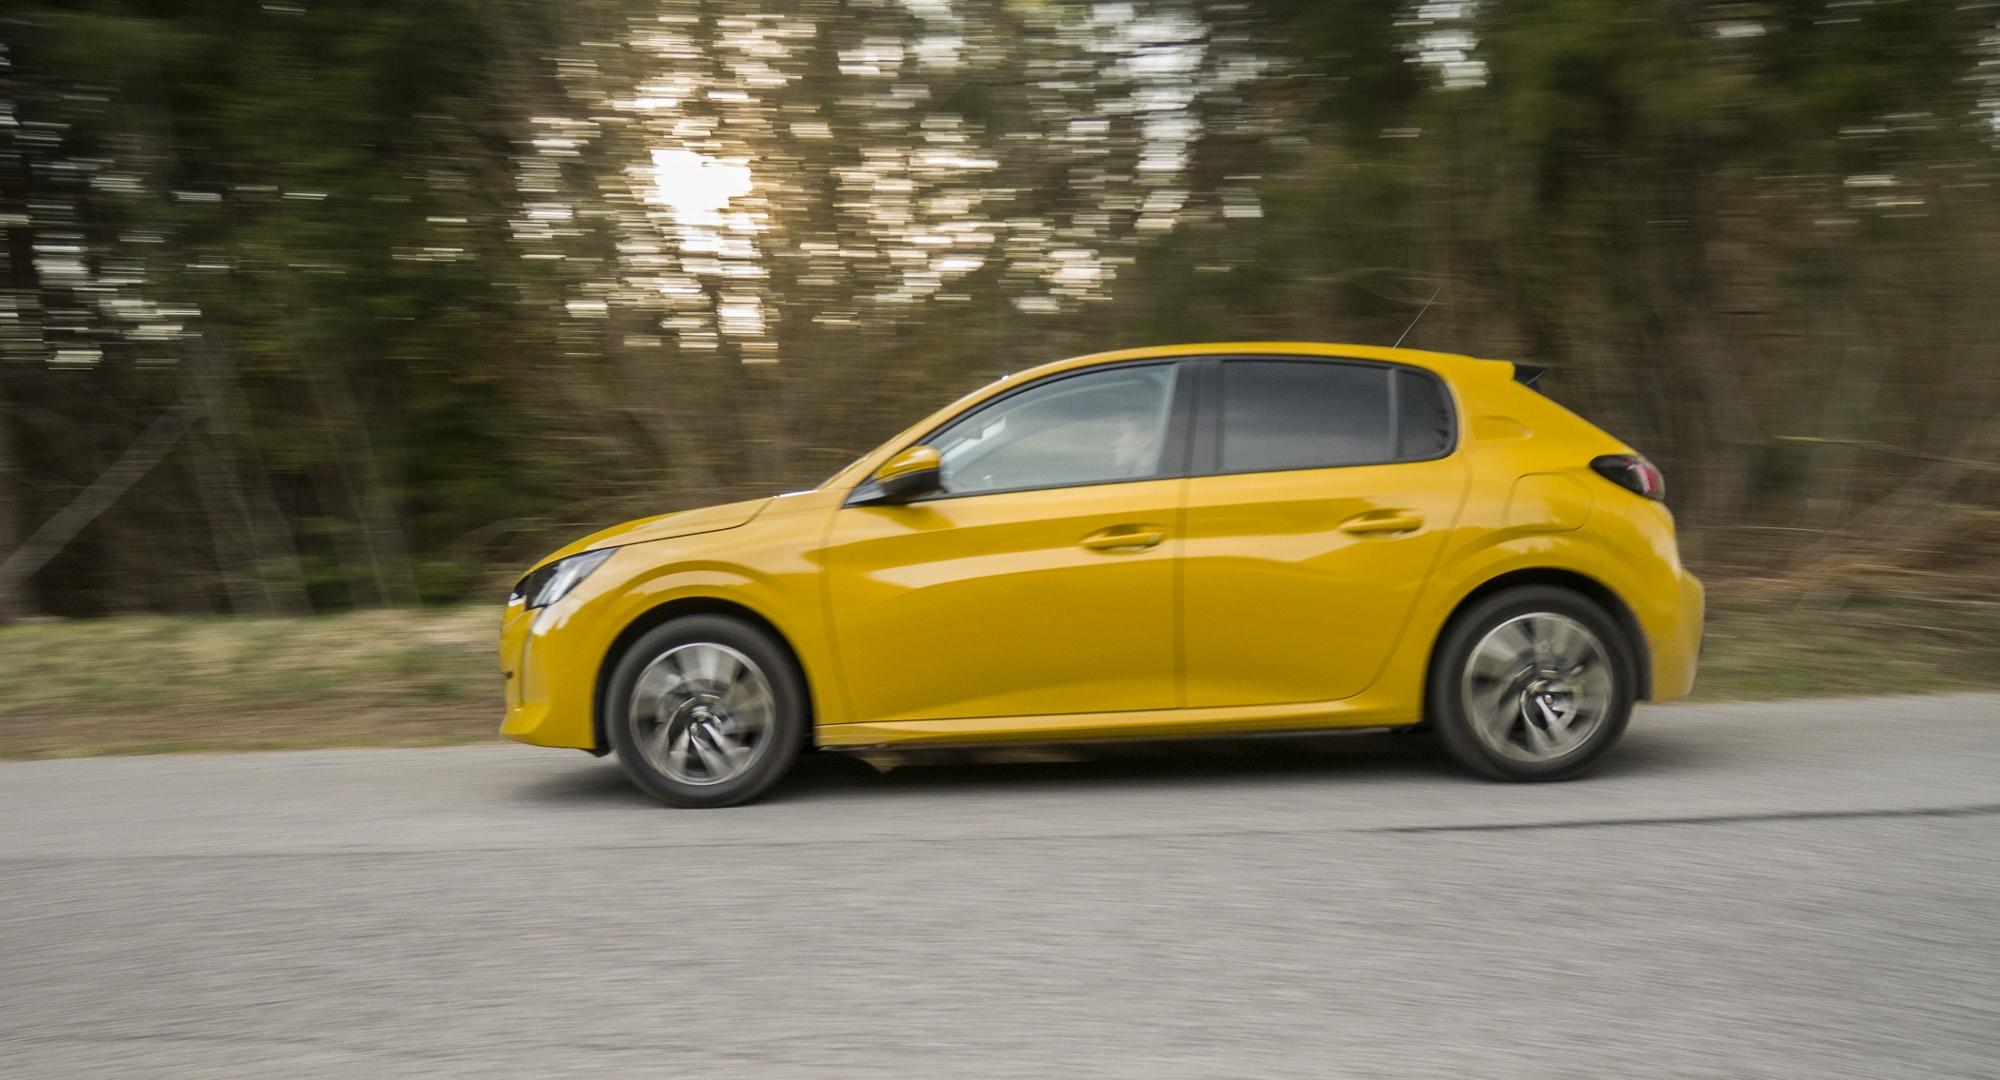 Test: Peugeot 208 prekvapivo pútal pohľady YdUHEfhzxL peugeot-208-4